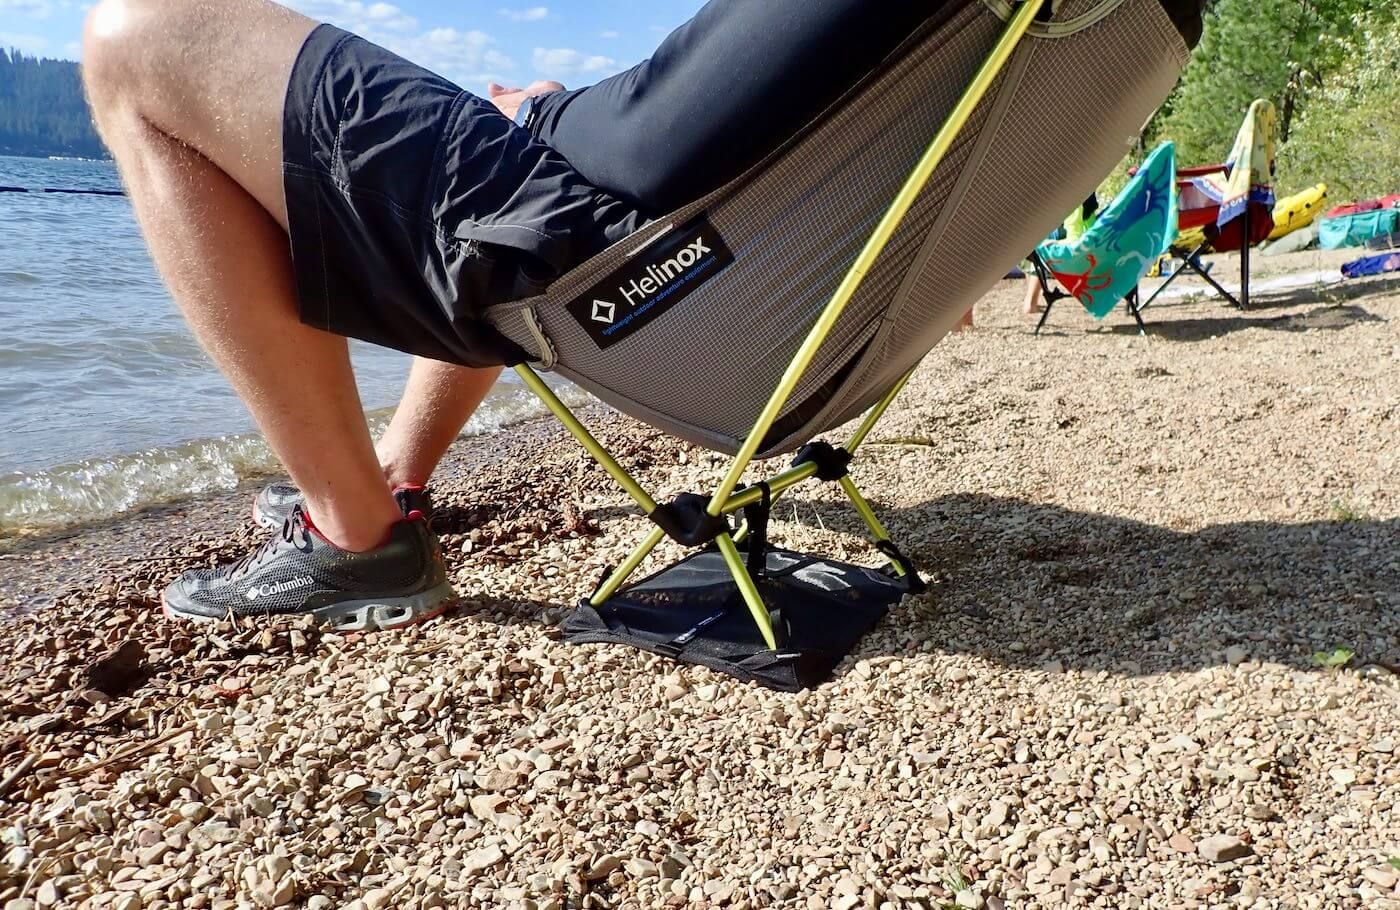 Helinox Chair Zero Review Lightweight Powerhouse Camping Chairs Camping Fun Backpacking Gifts